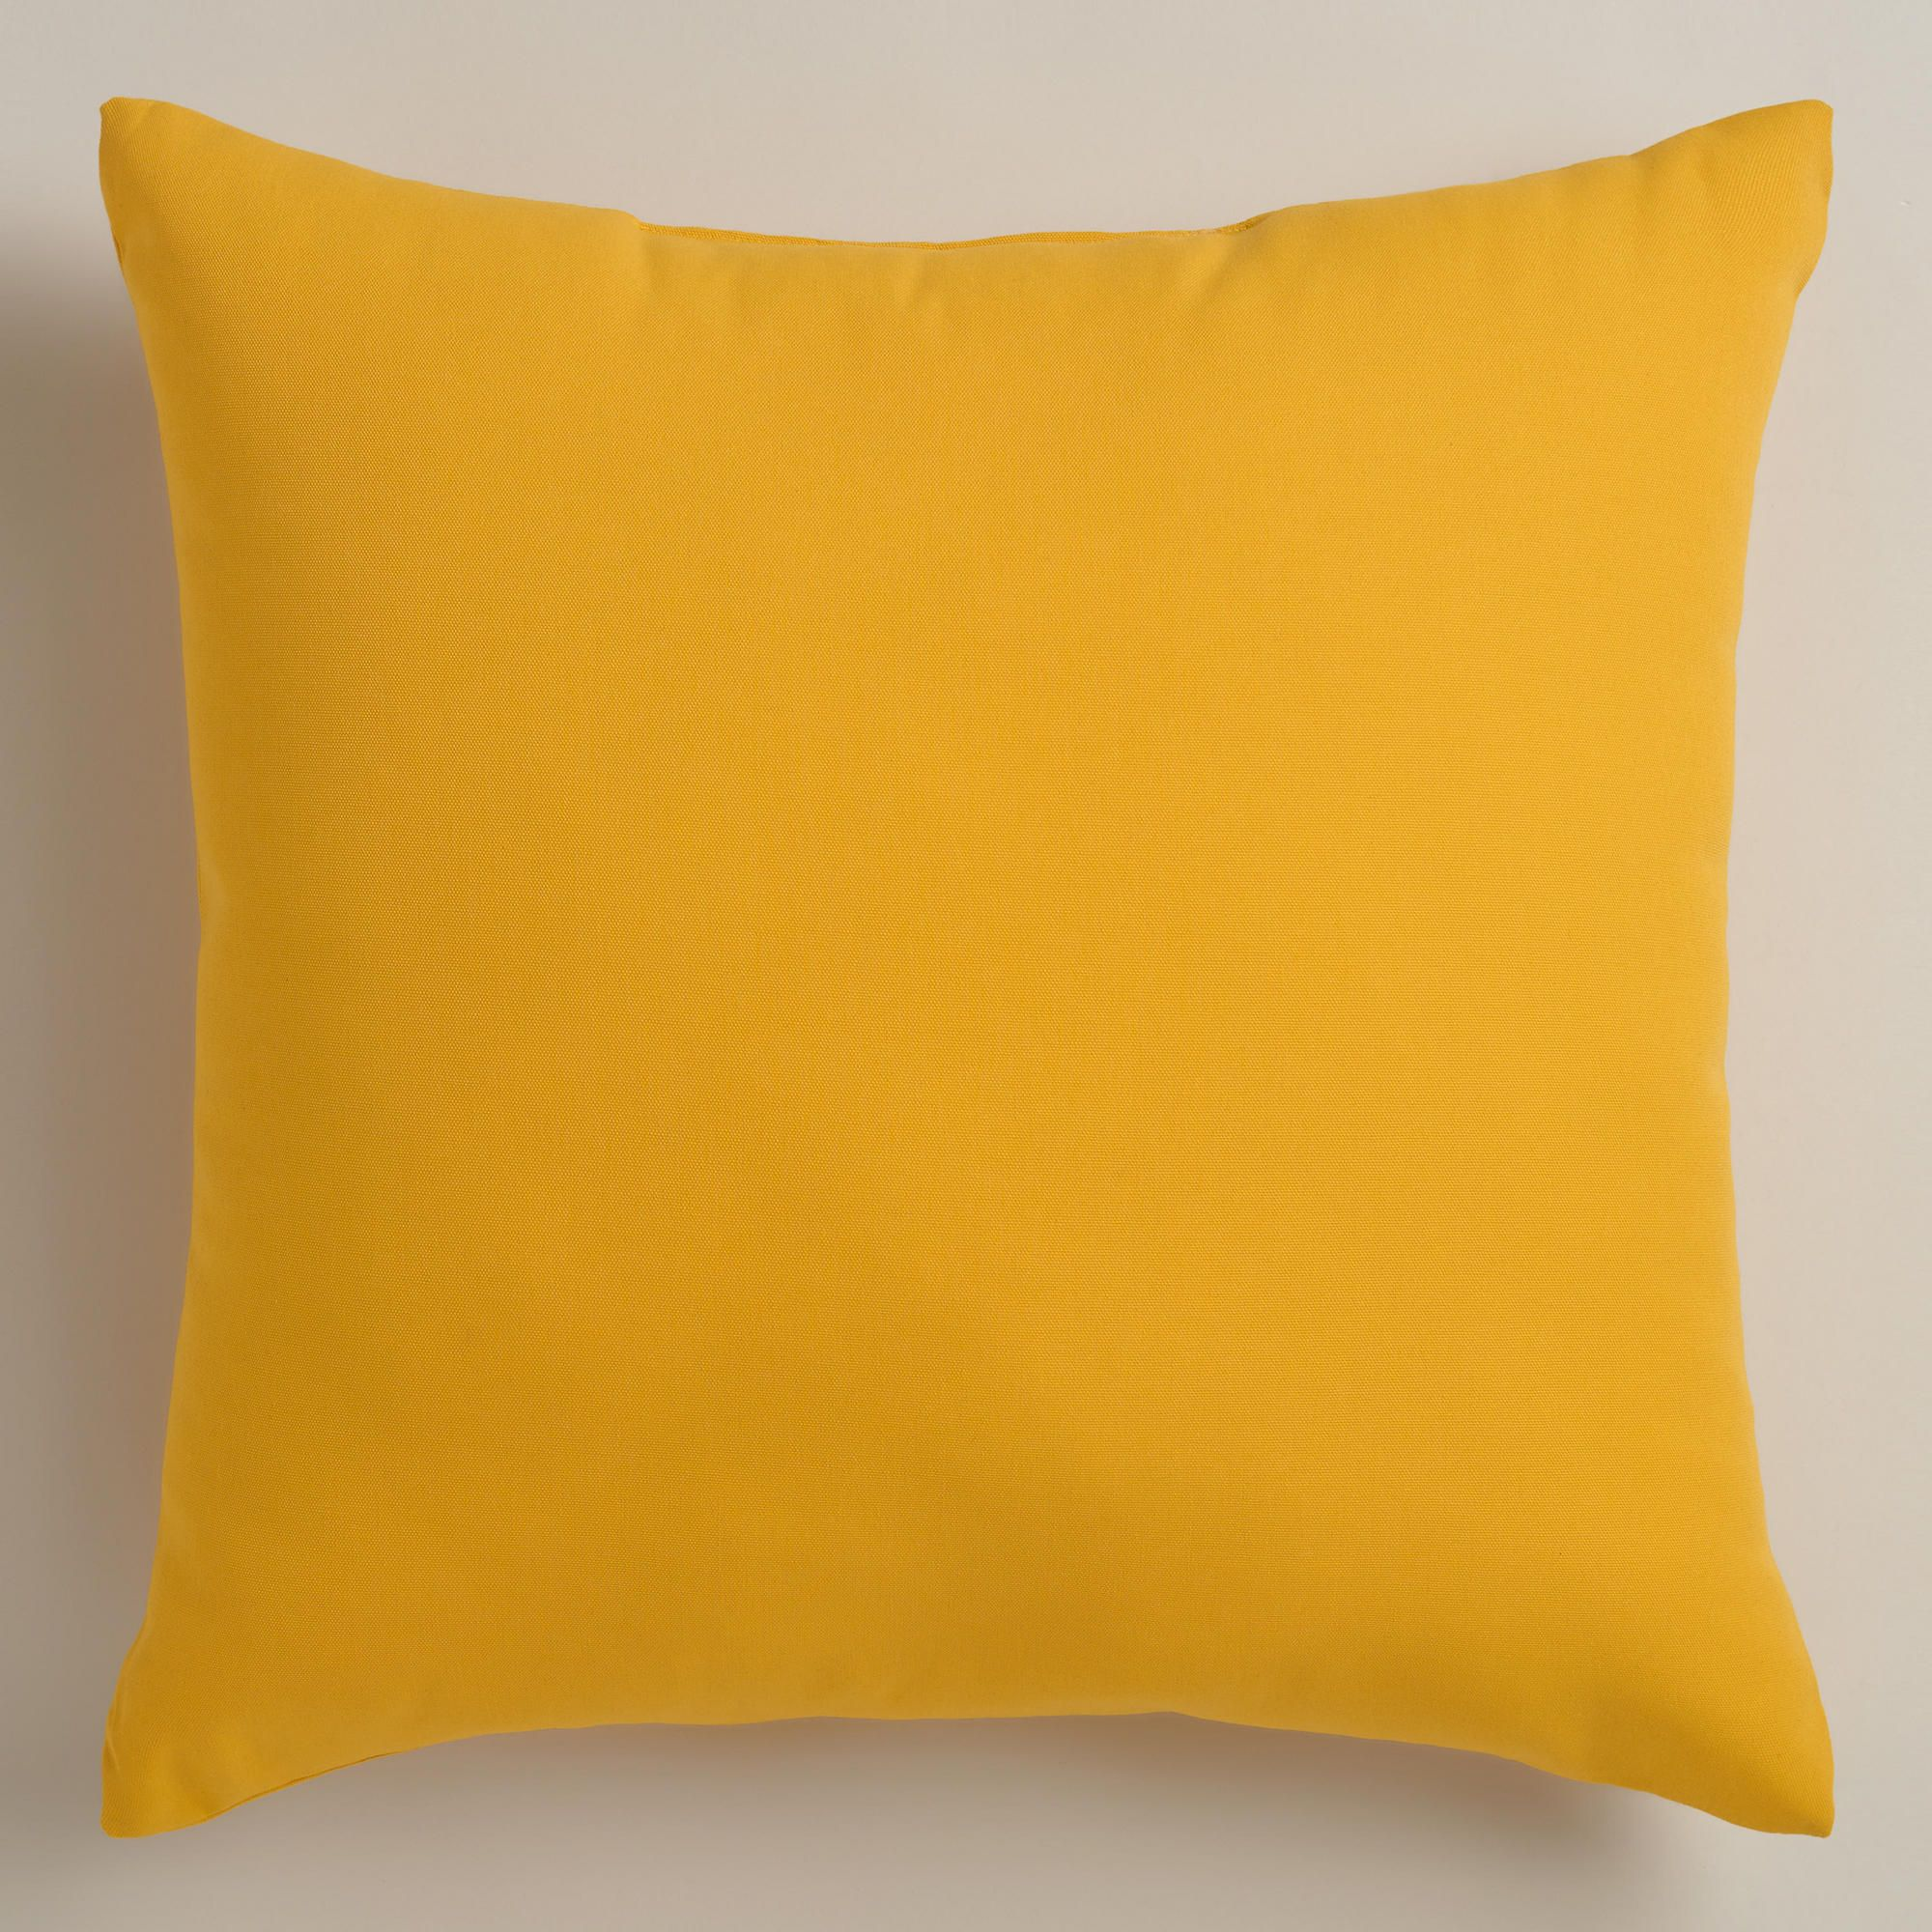 Yellow Outdoor Throw Pillows | World Market